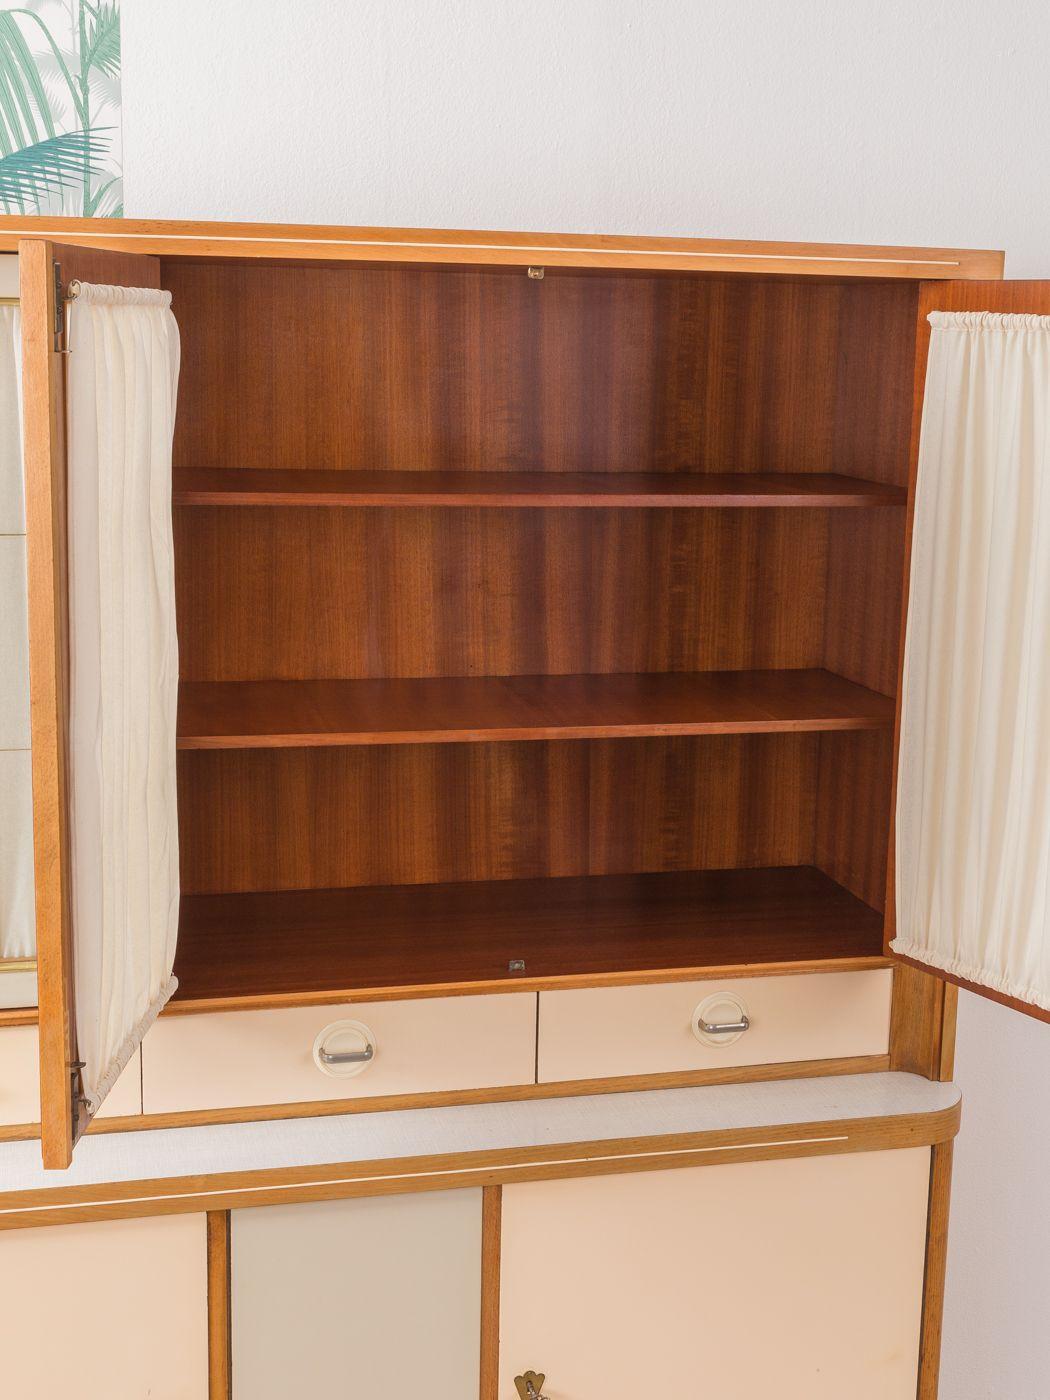 Vintage german kitchen cabinet - Design Market